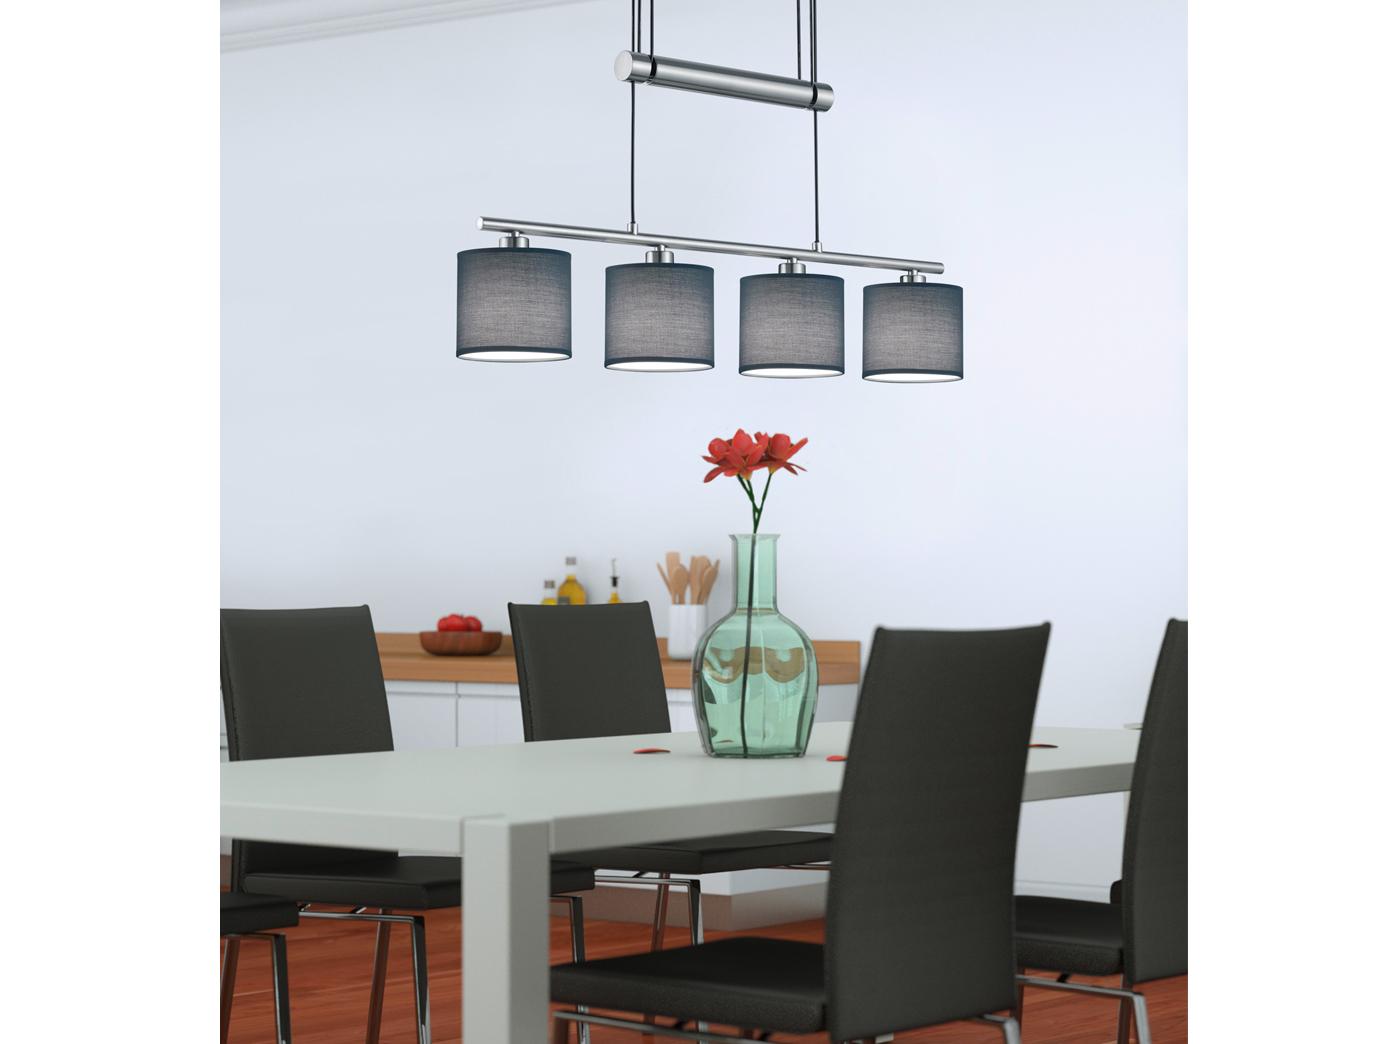 jojo h ngelampe garda 4flammig lampenschirme stoff grau. Black Bedroom Furniture Sets. Home Design Ideas